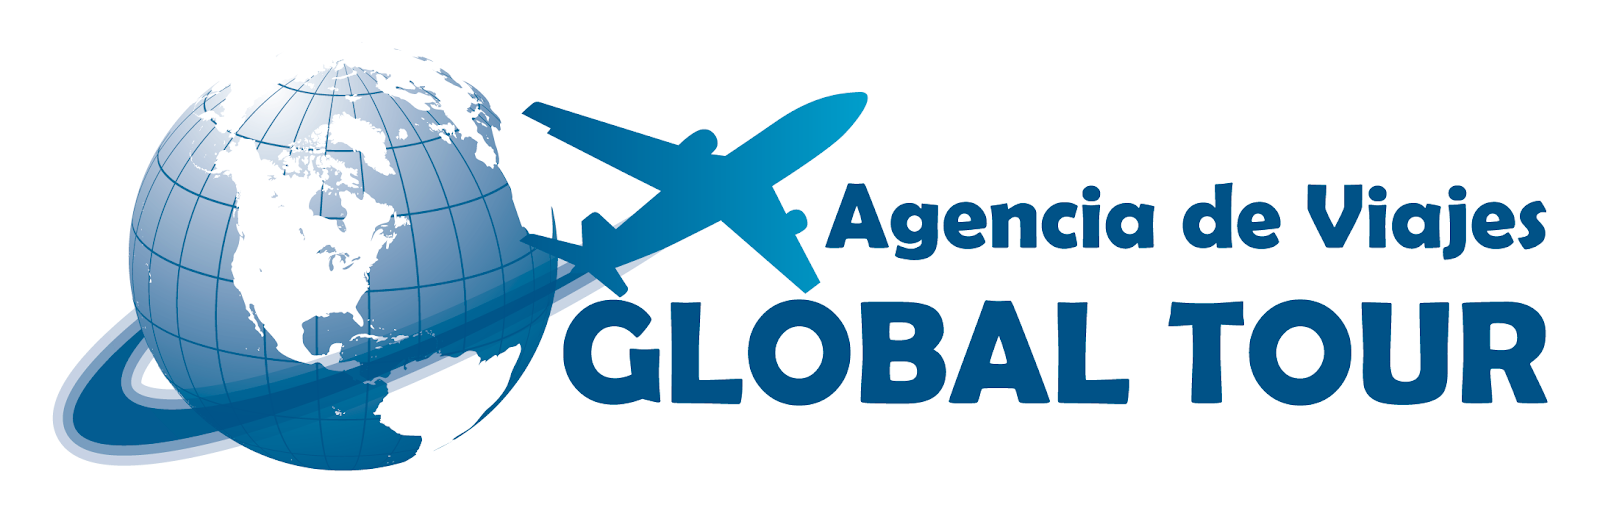 Agencia de Viajes Global Tour Cía Ltda.